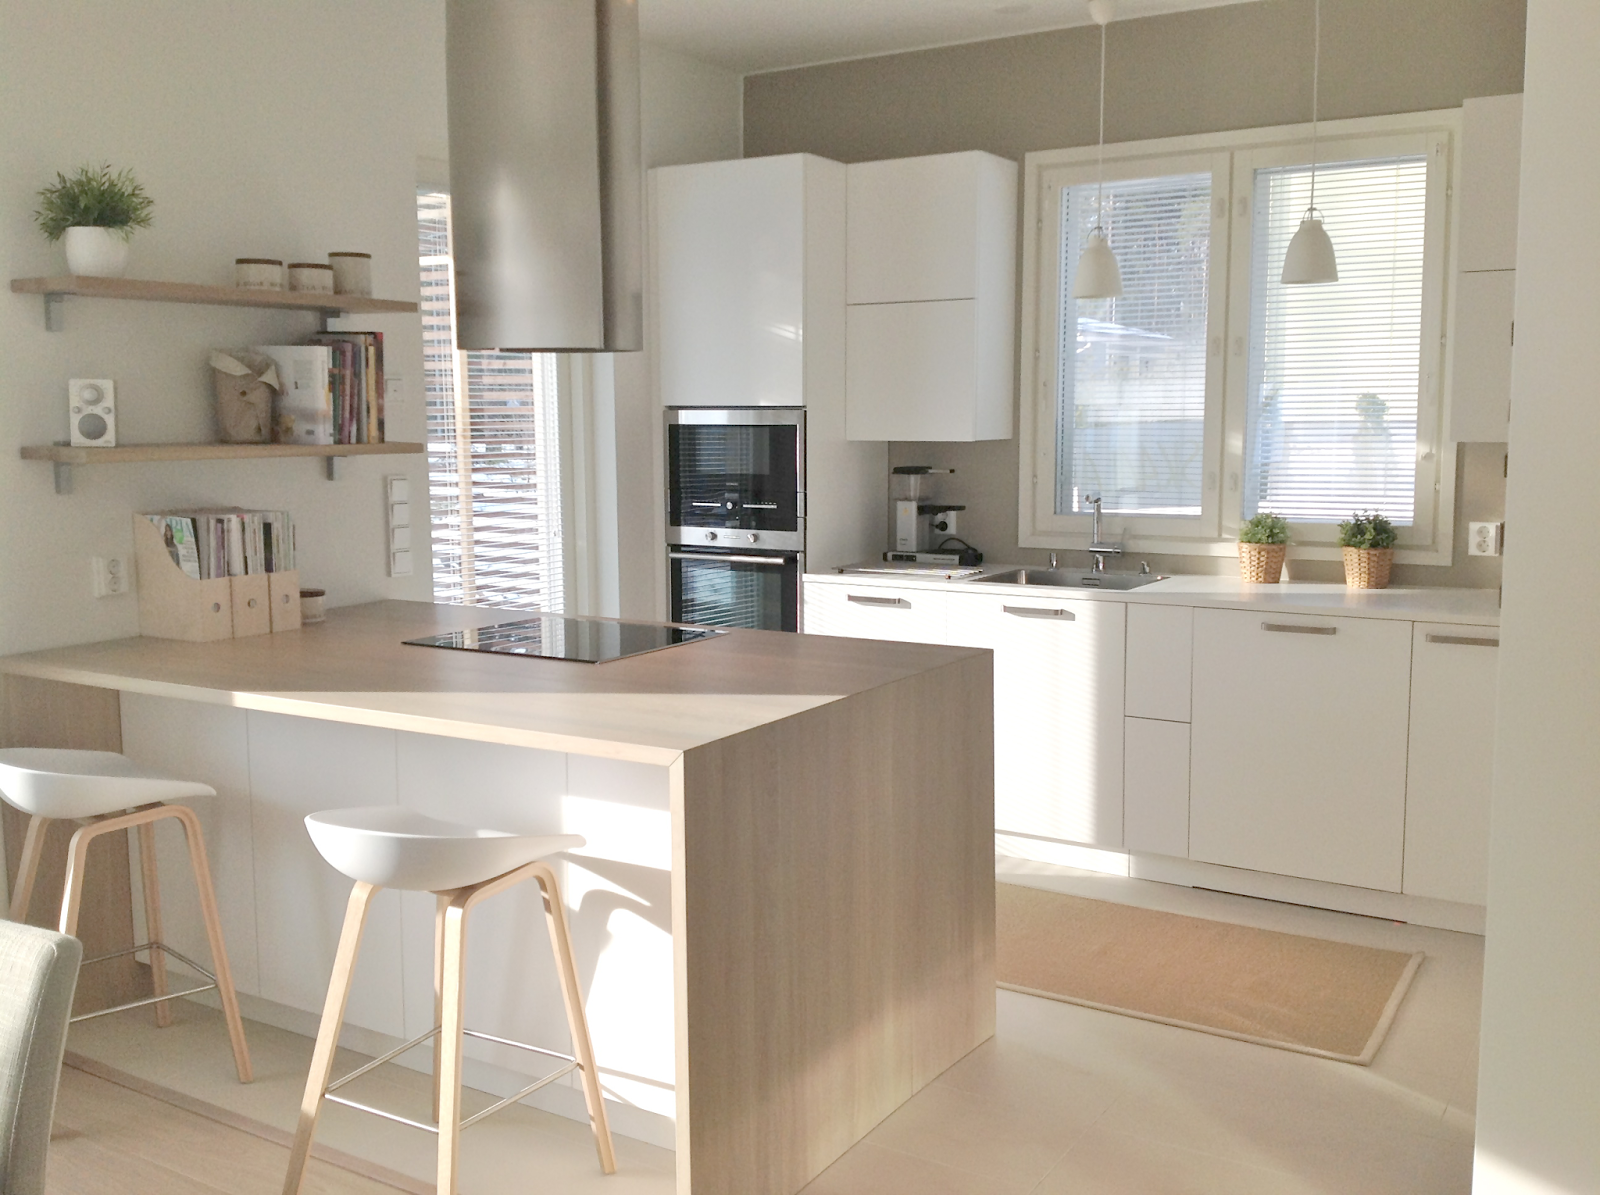 keittiön saareke, keittiön niemeke, keittiön suunnittelu